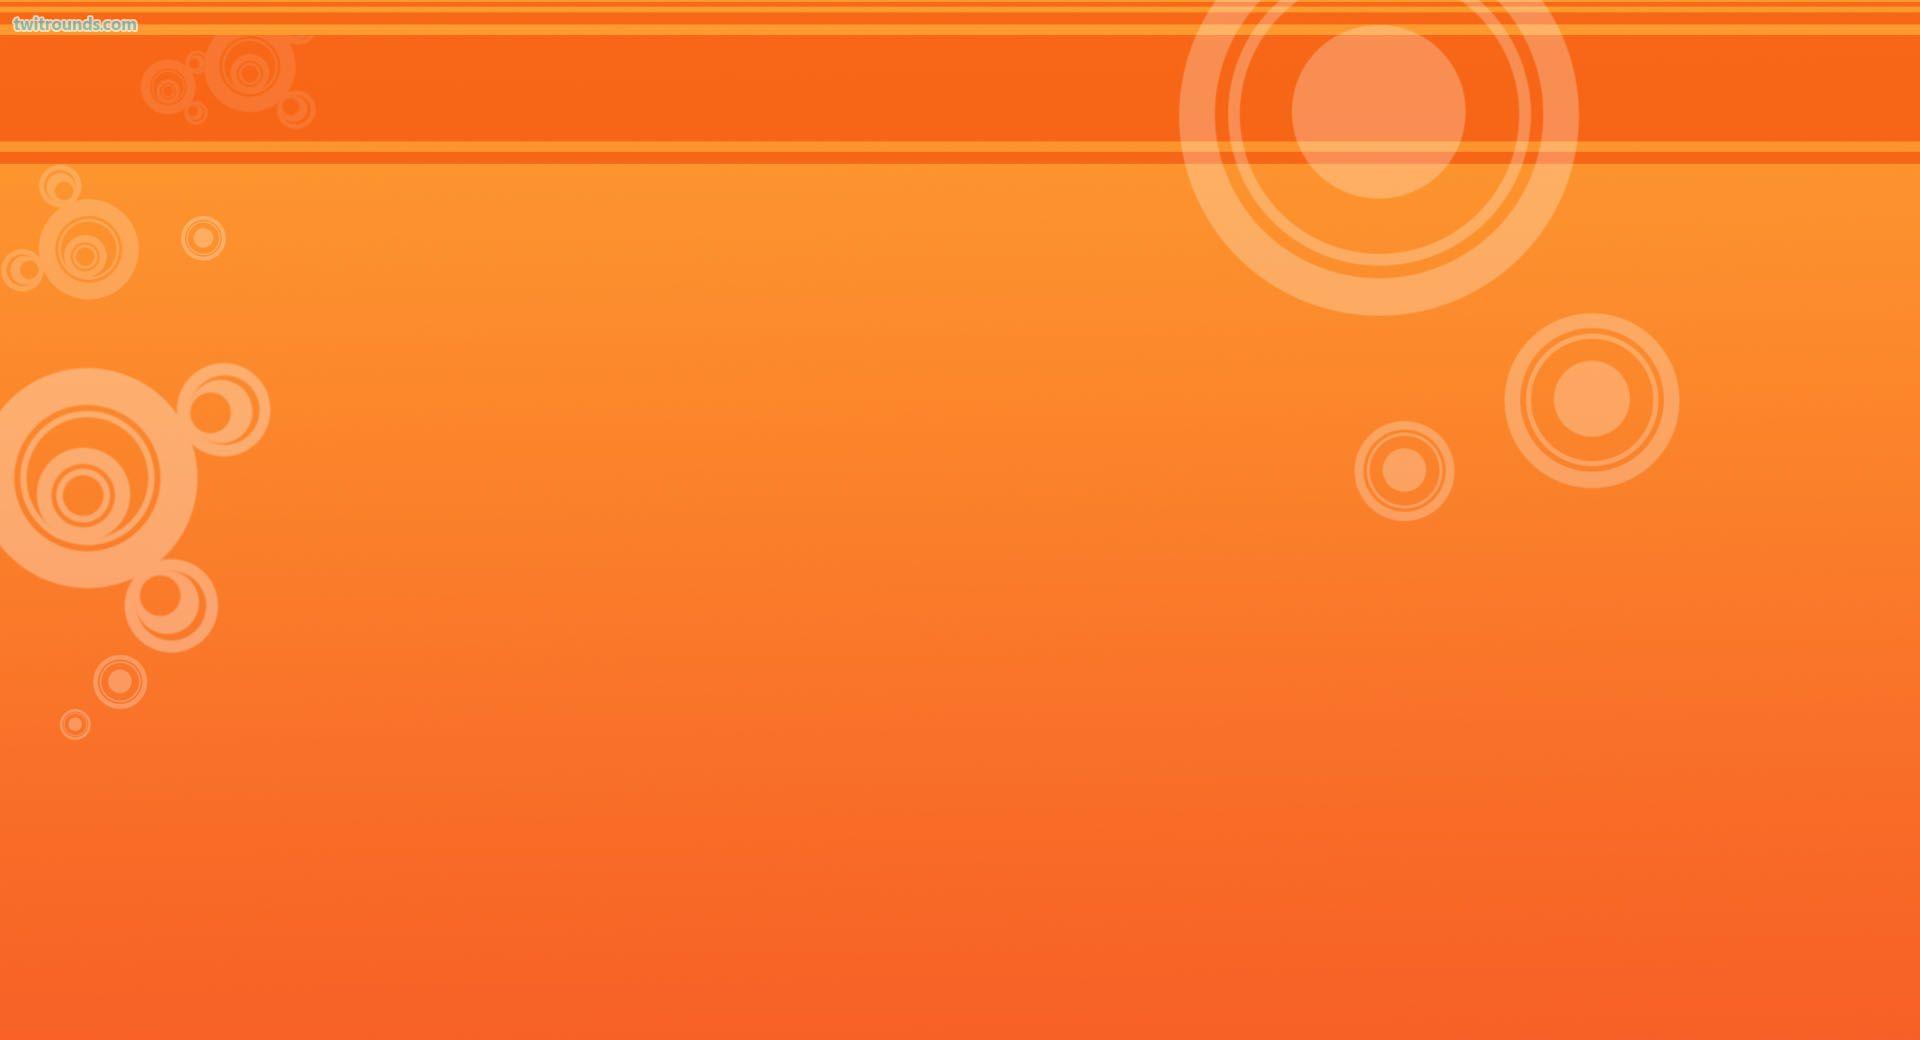 Orange Is The Colour Of Saffron Carrots Pumpkins And Apricots It Between